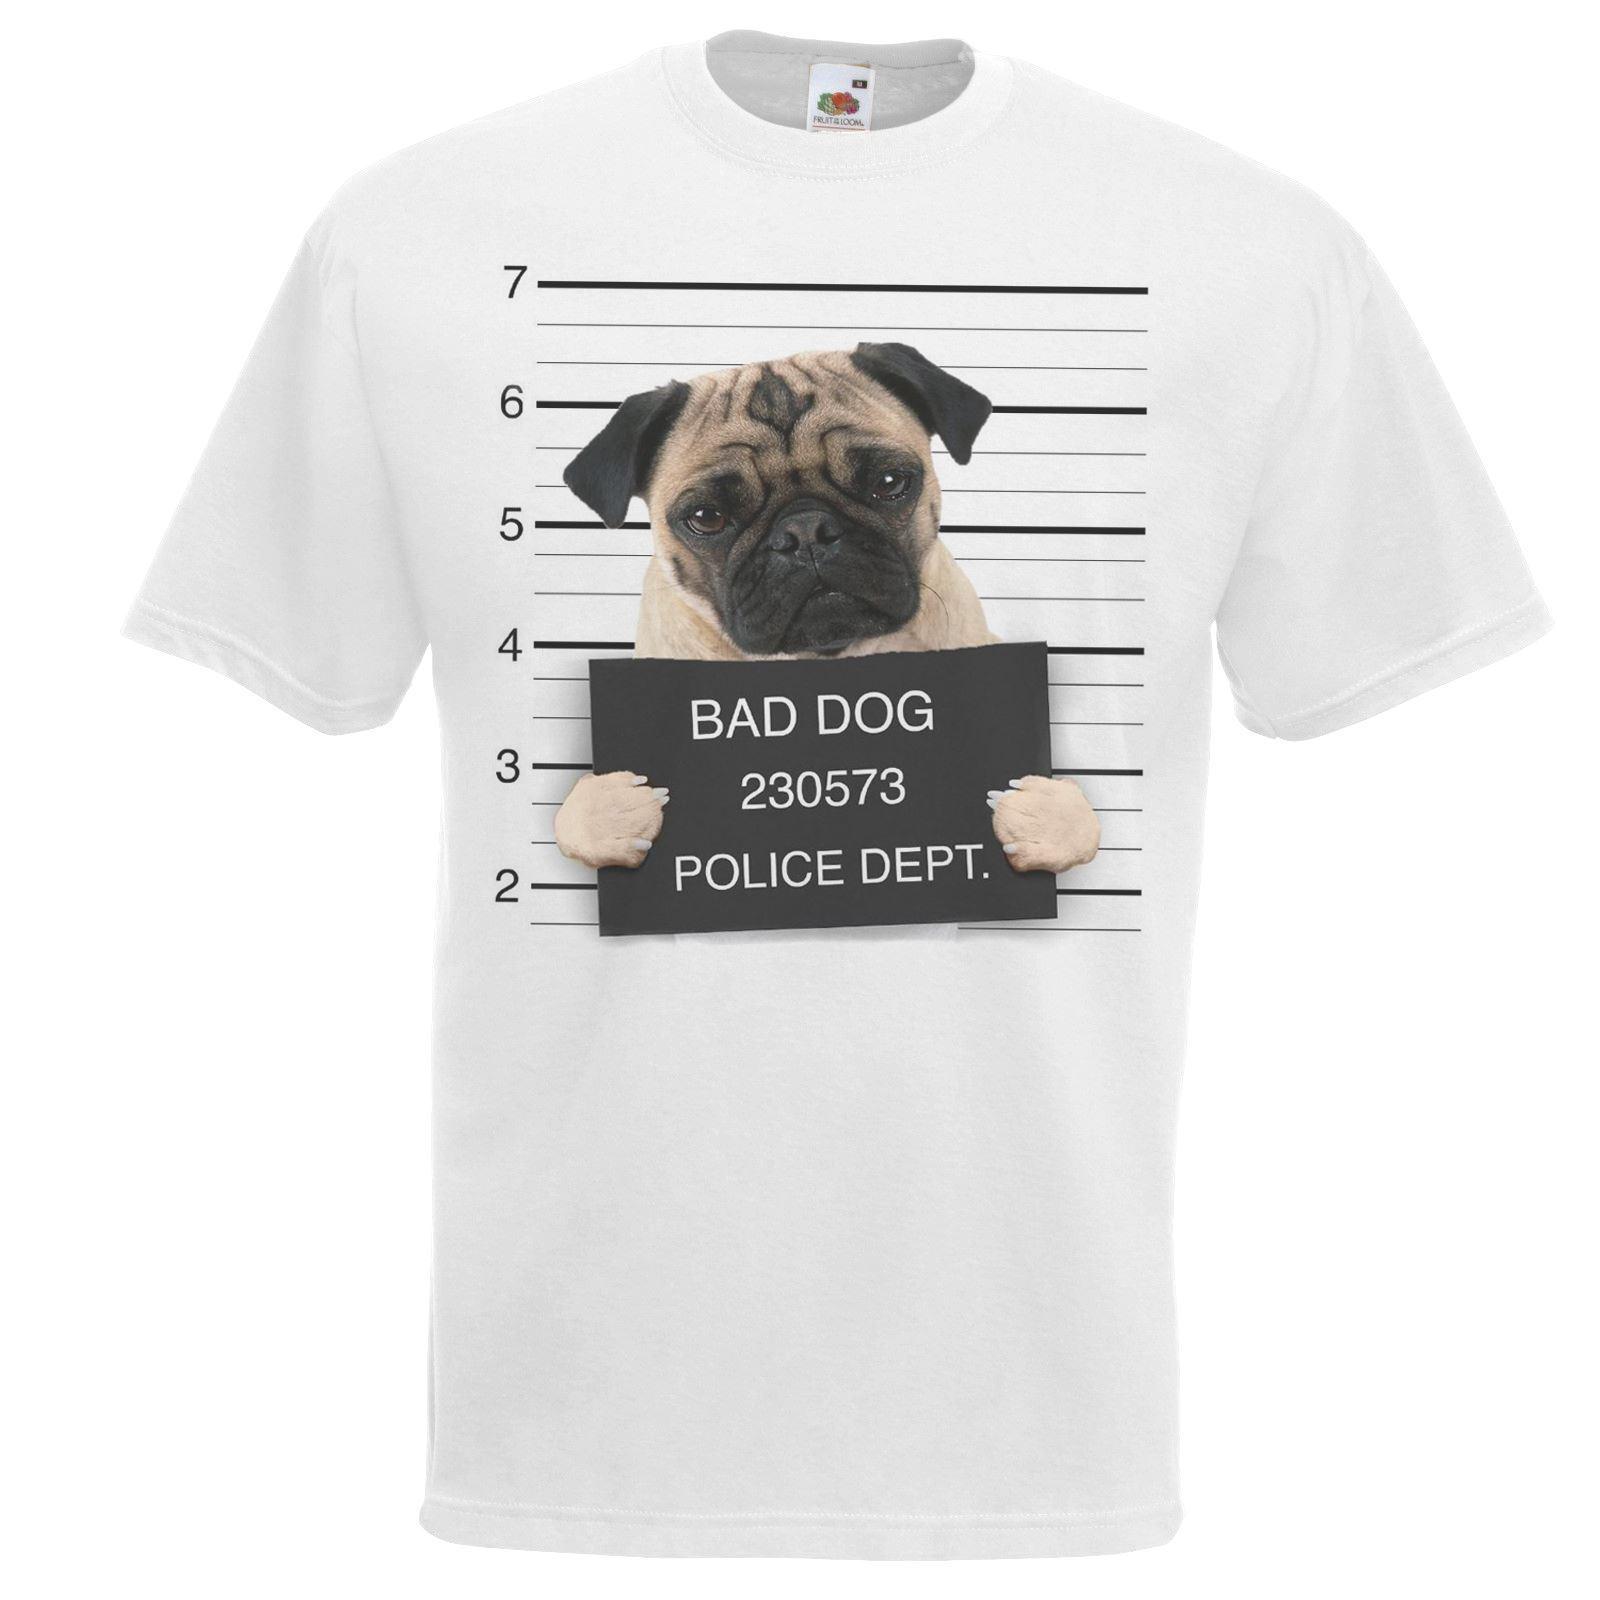 New 2019 Fashion Hot Fashion T Shirt Brand White Dog Mugshot Cute Pug Puggle T-Shirt Criminal K9 Company T Shirts